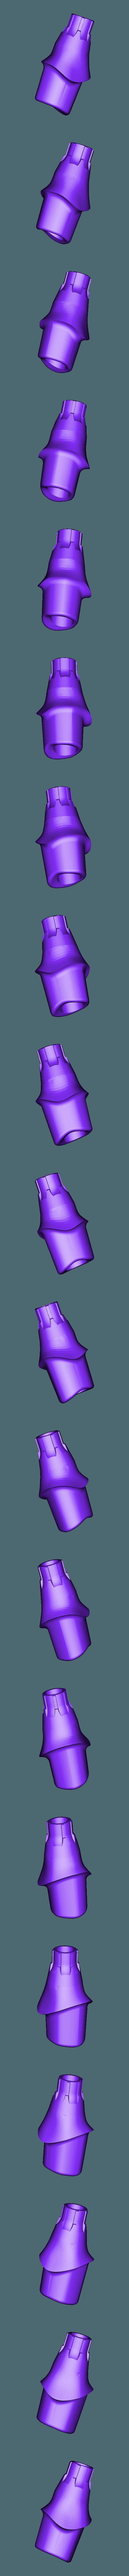 Custom Abutment.stl Download OBJ file Digital Implant Model with Soft Tissue • 3D printing object, LabMagic3DCAD